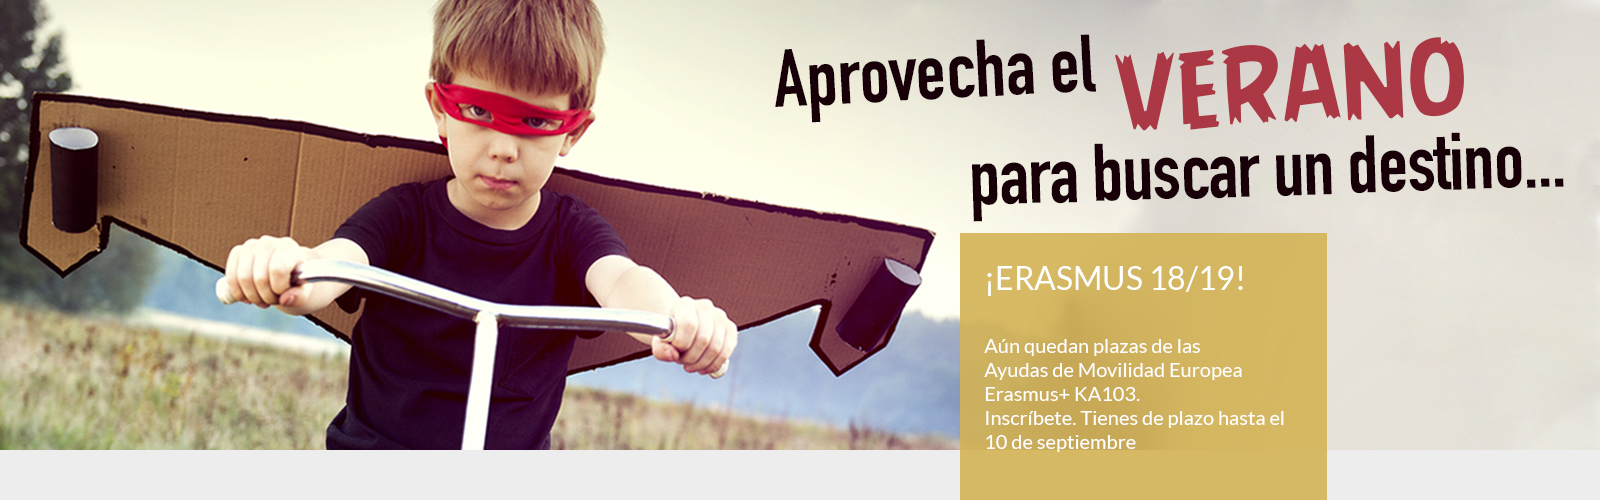 Campaña Erasmus